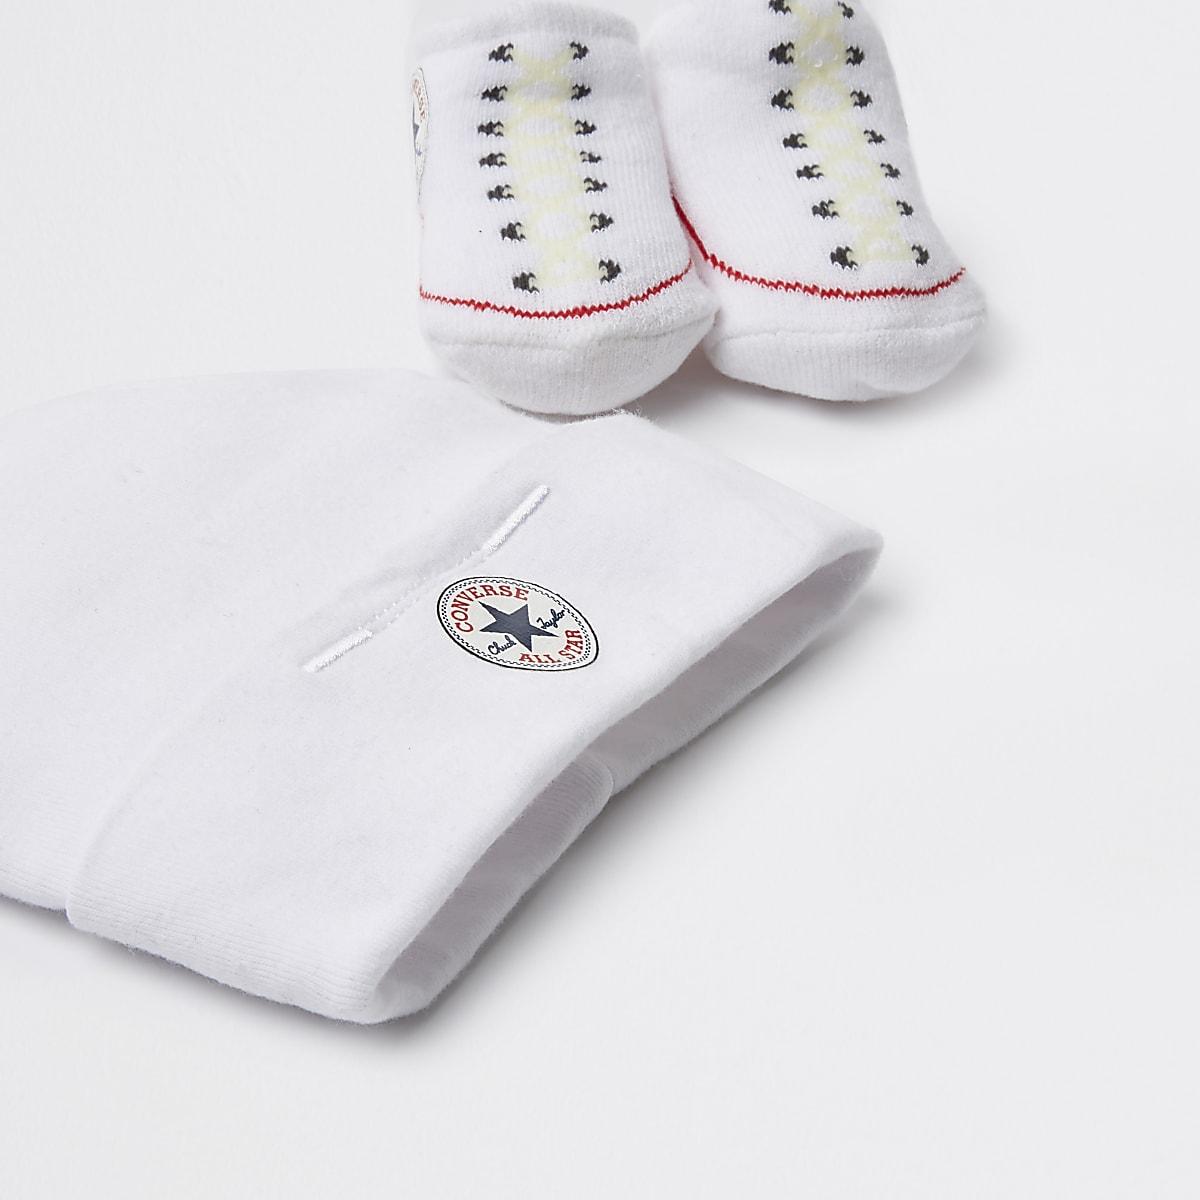 9dba104eb7a6 Baby Converse All Star white hat set - Baby Girls Accessories - Mini ...